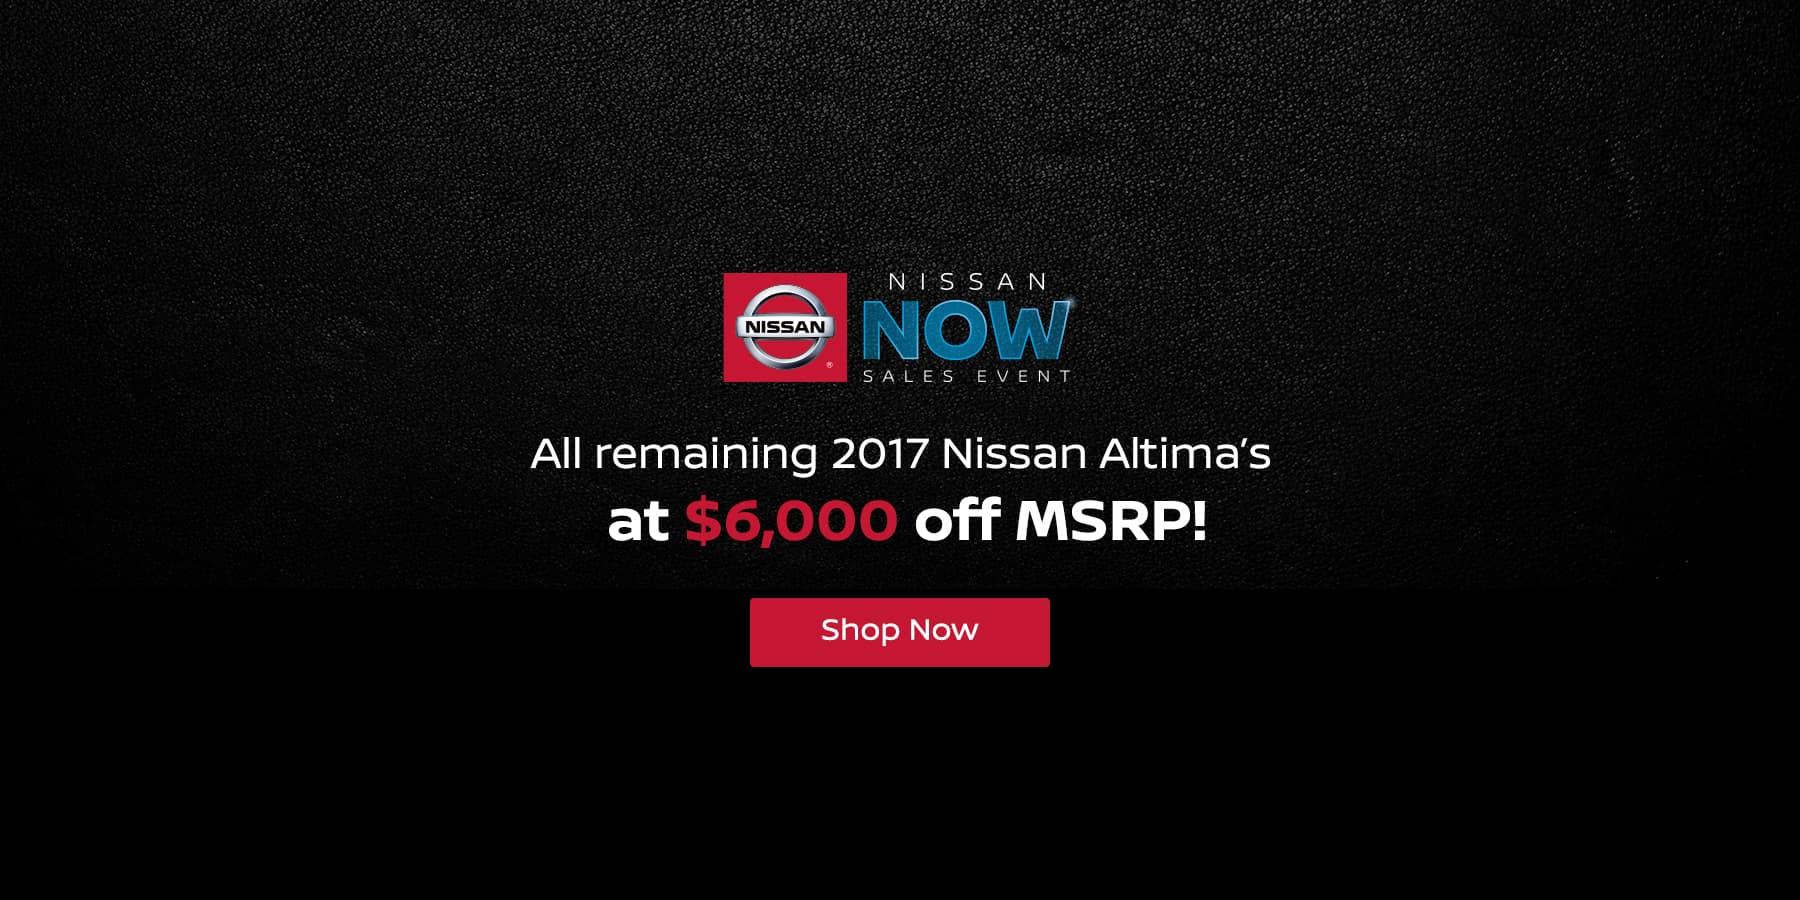 Jeffrey Nissan 2017 Altima $6,000 Off MSRP